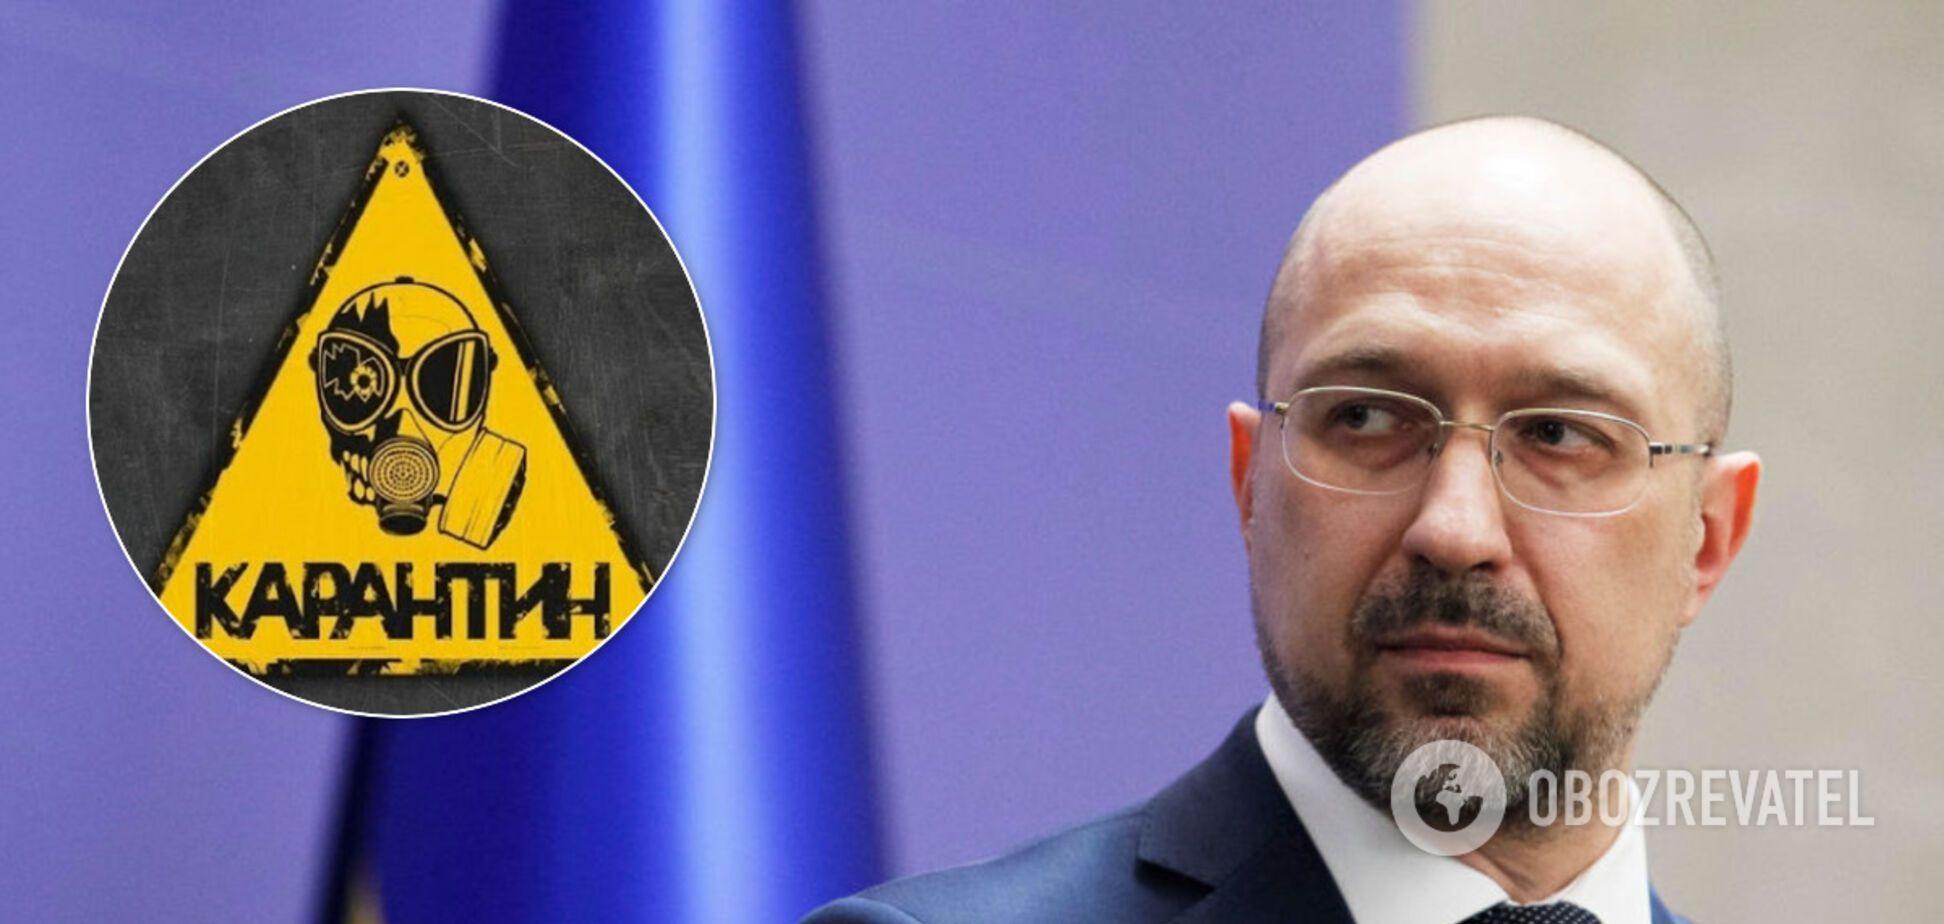 Кабмин усилил карантин: что запретили украинцам